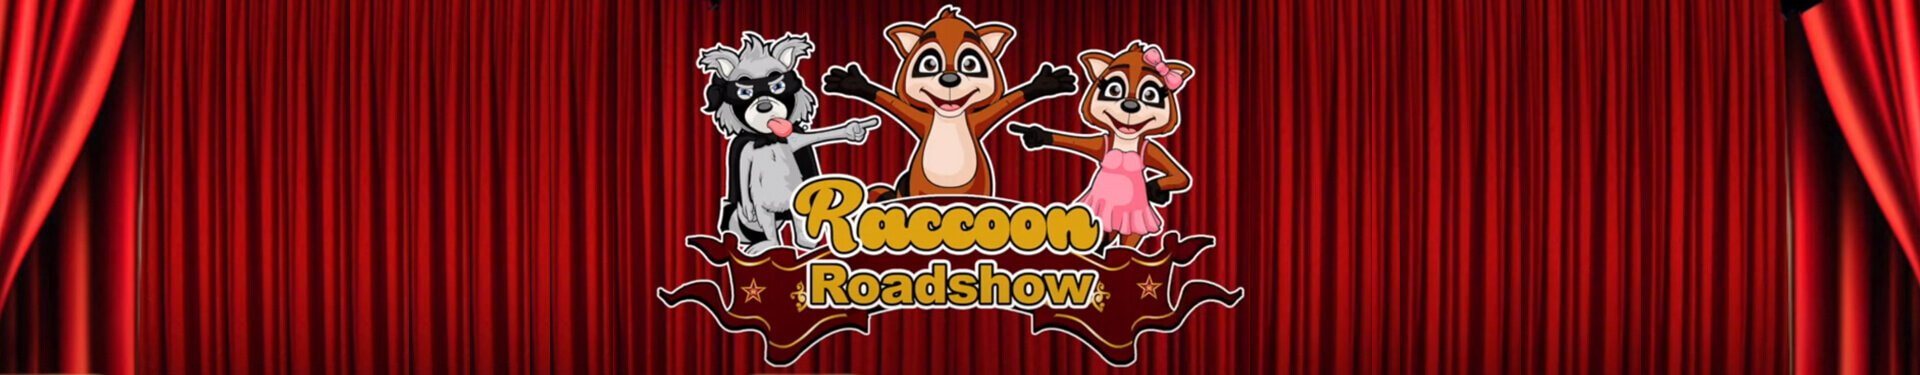 racoon roadshow event